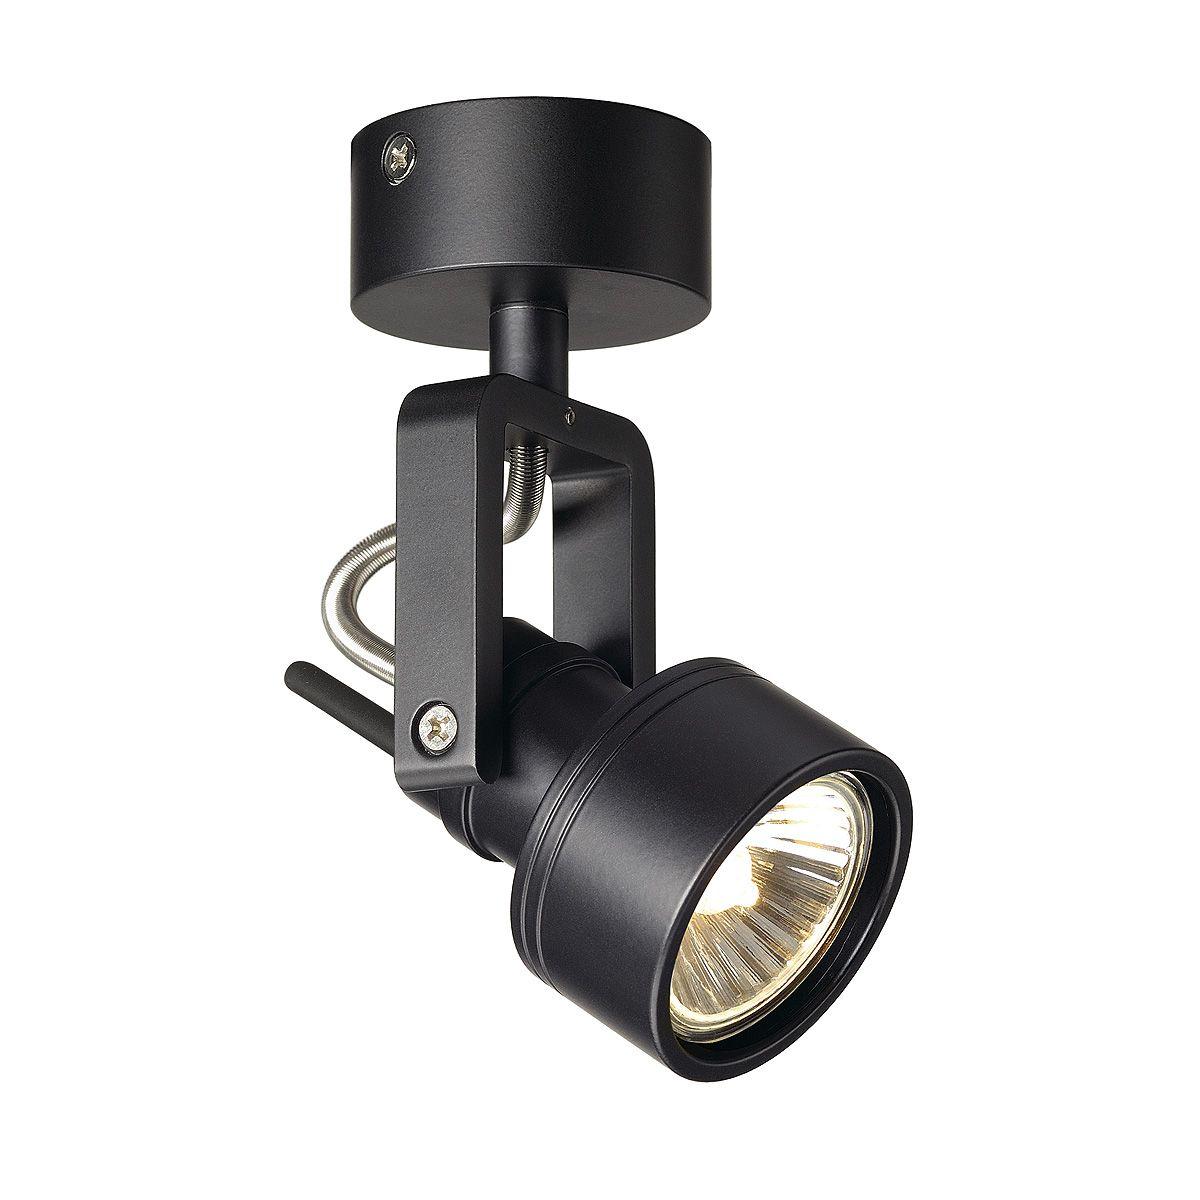 Inda Spot Gu10 Ceiling Lights Lighting Shop Lighting